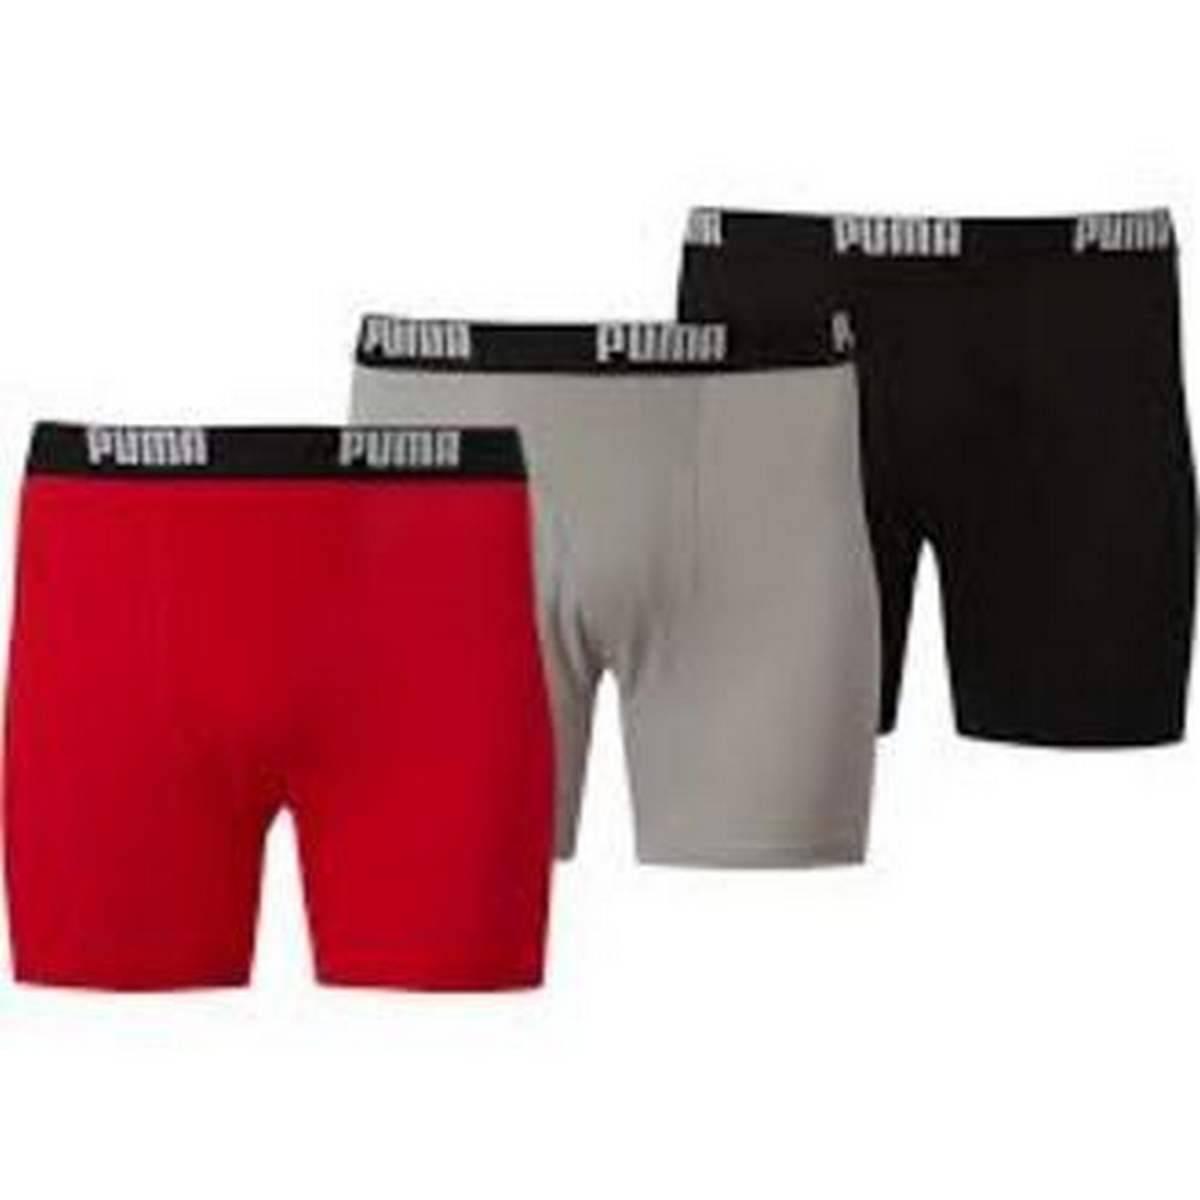 Pack of 3 Men Underwear pure cotton boxer underwear for men sale Price under wear, under wear